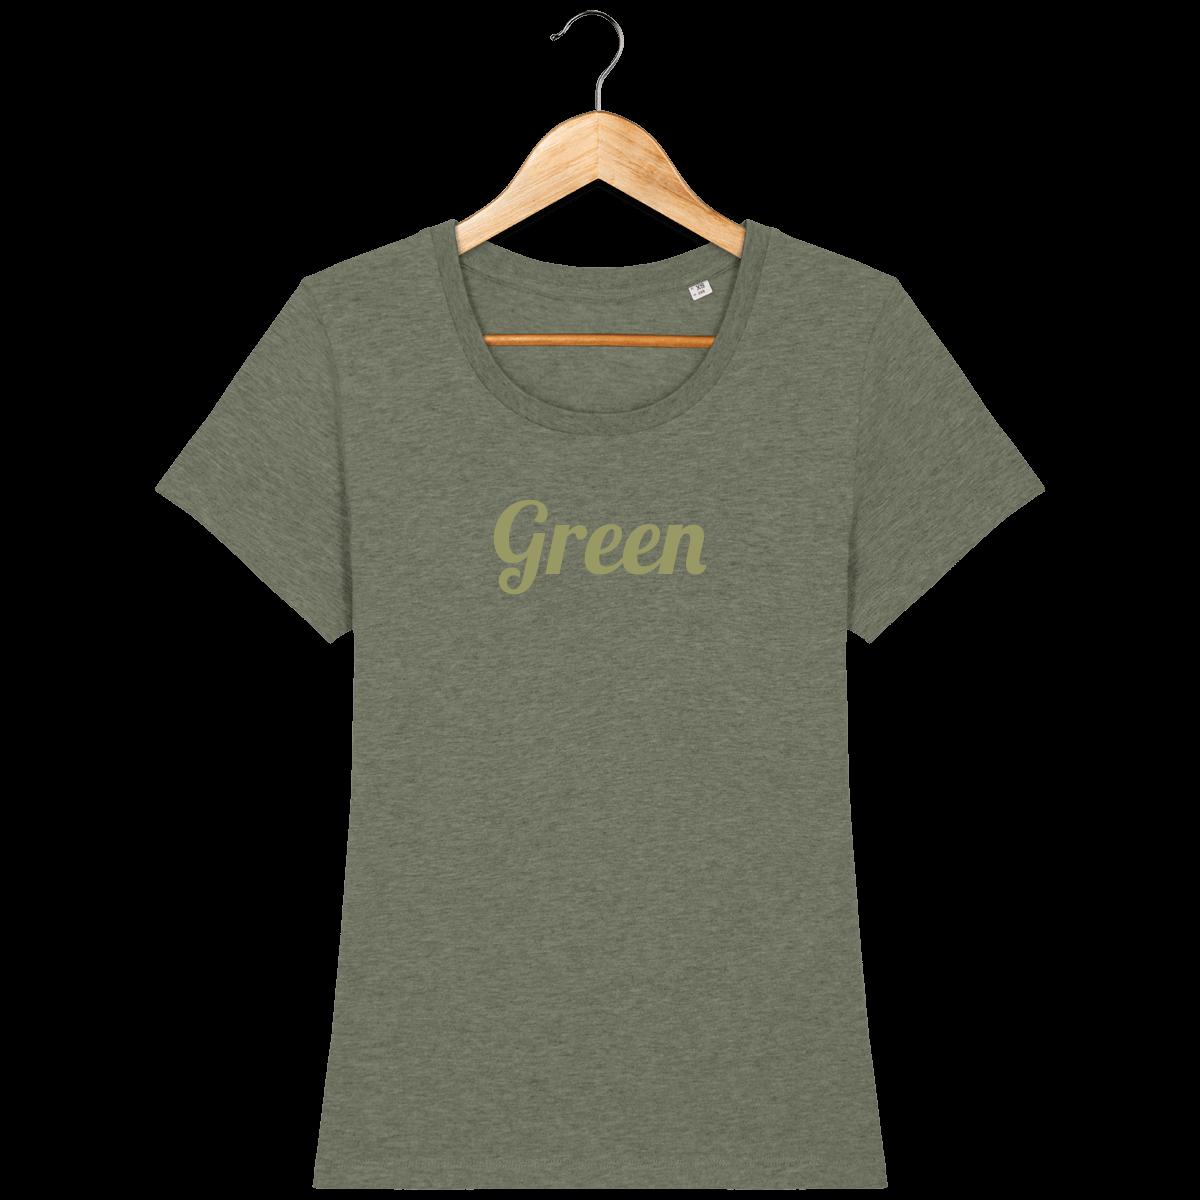 tee-shirt-ajuste-bio-brode-green-mastic_mid-heather-khaki_face